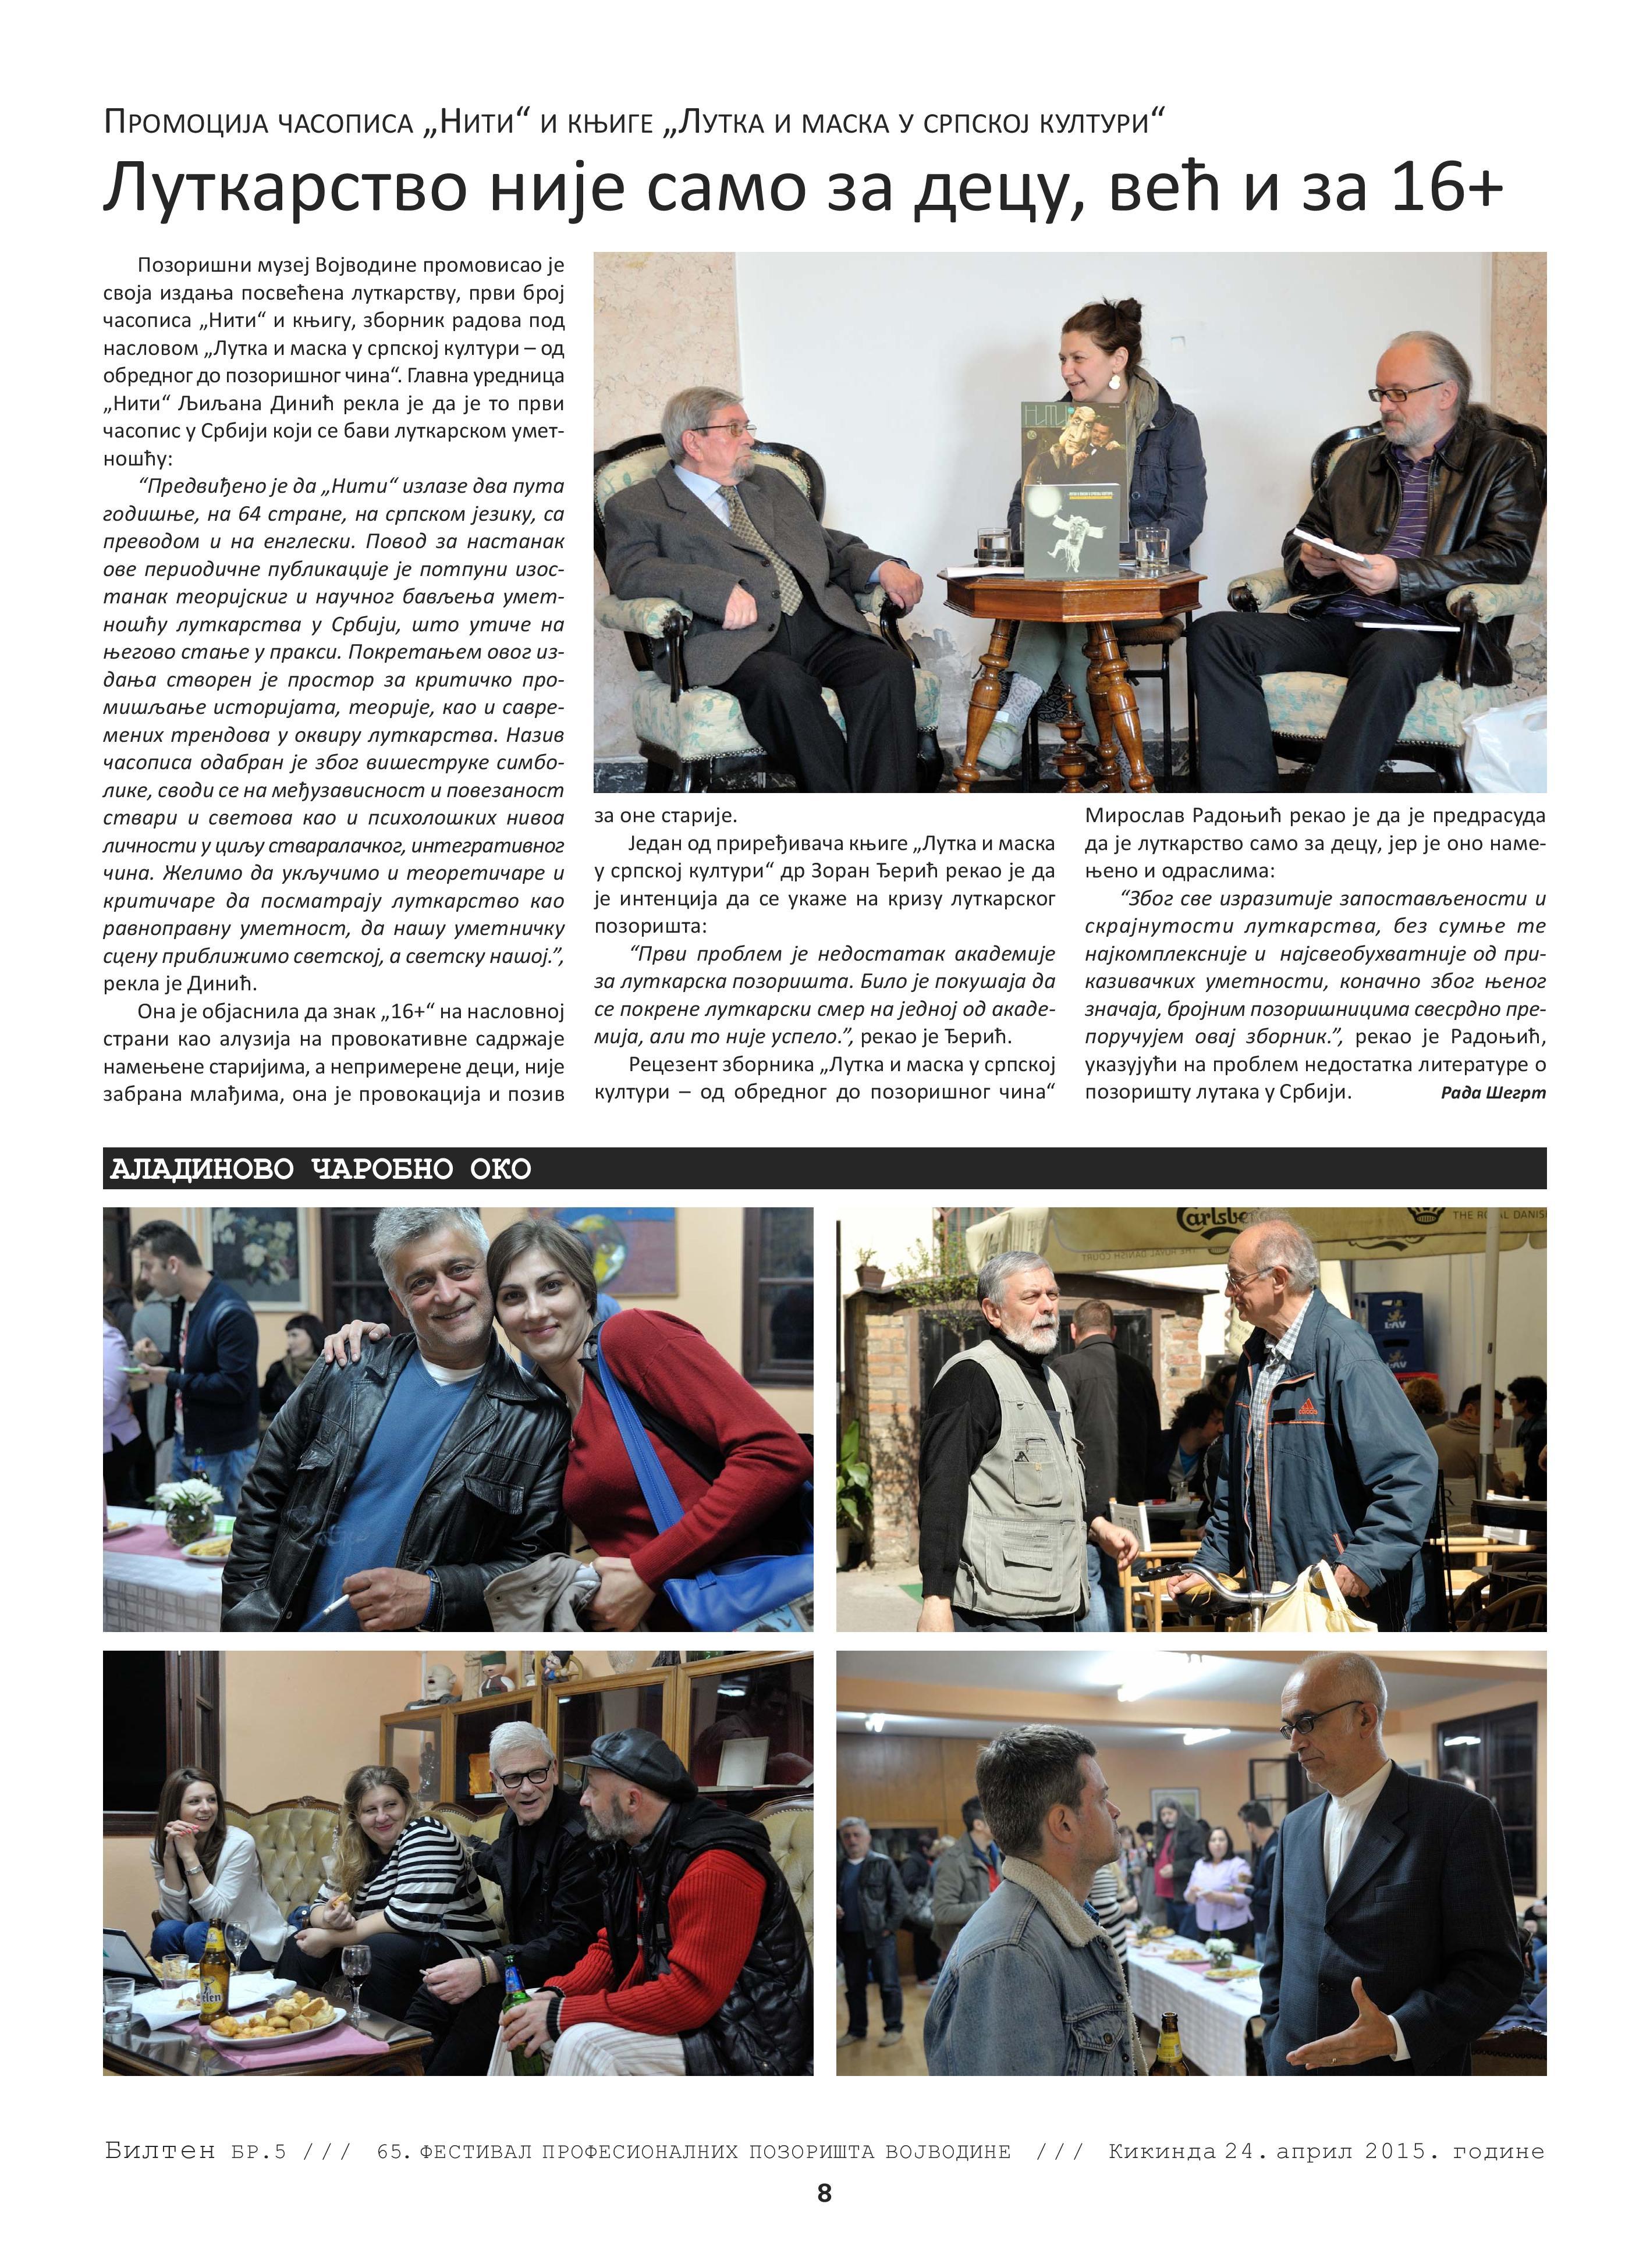 BILTEN_05_24 april-page-008